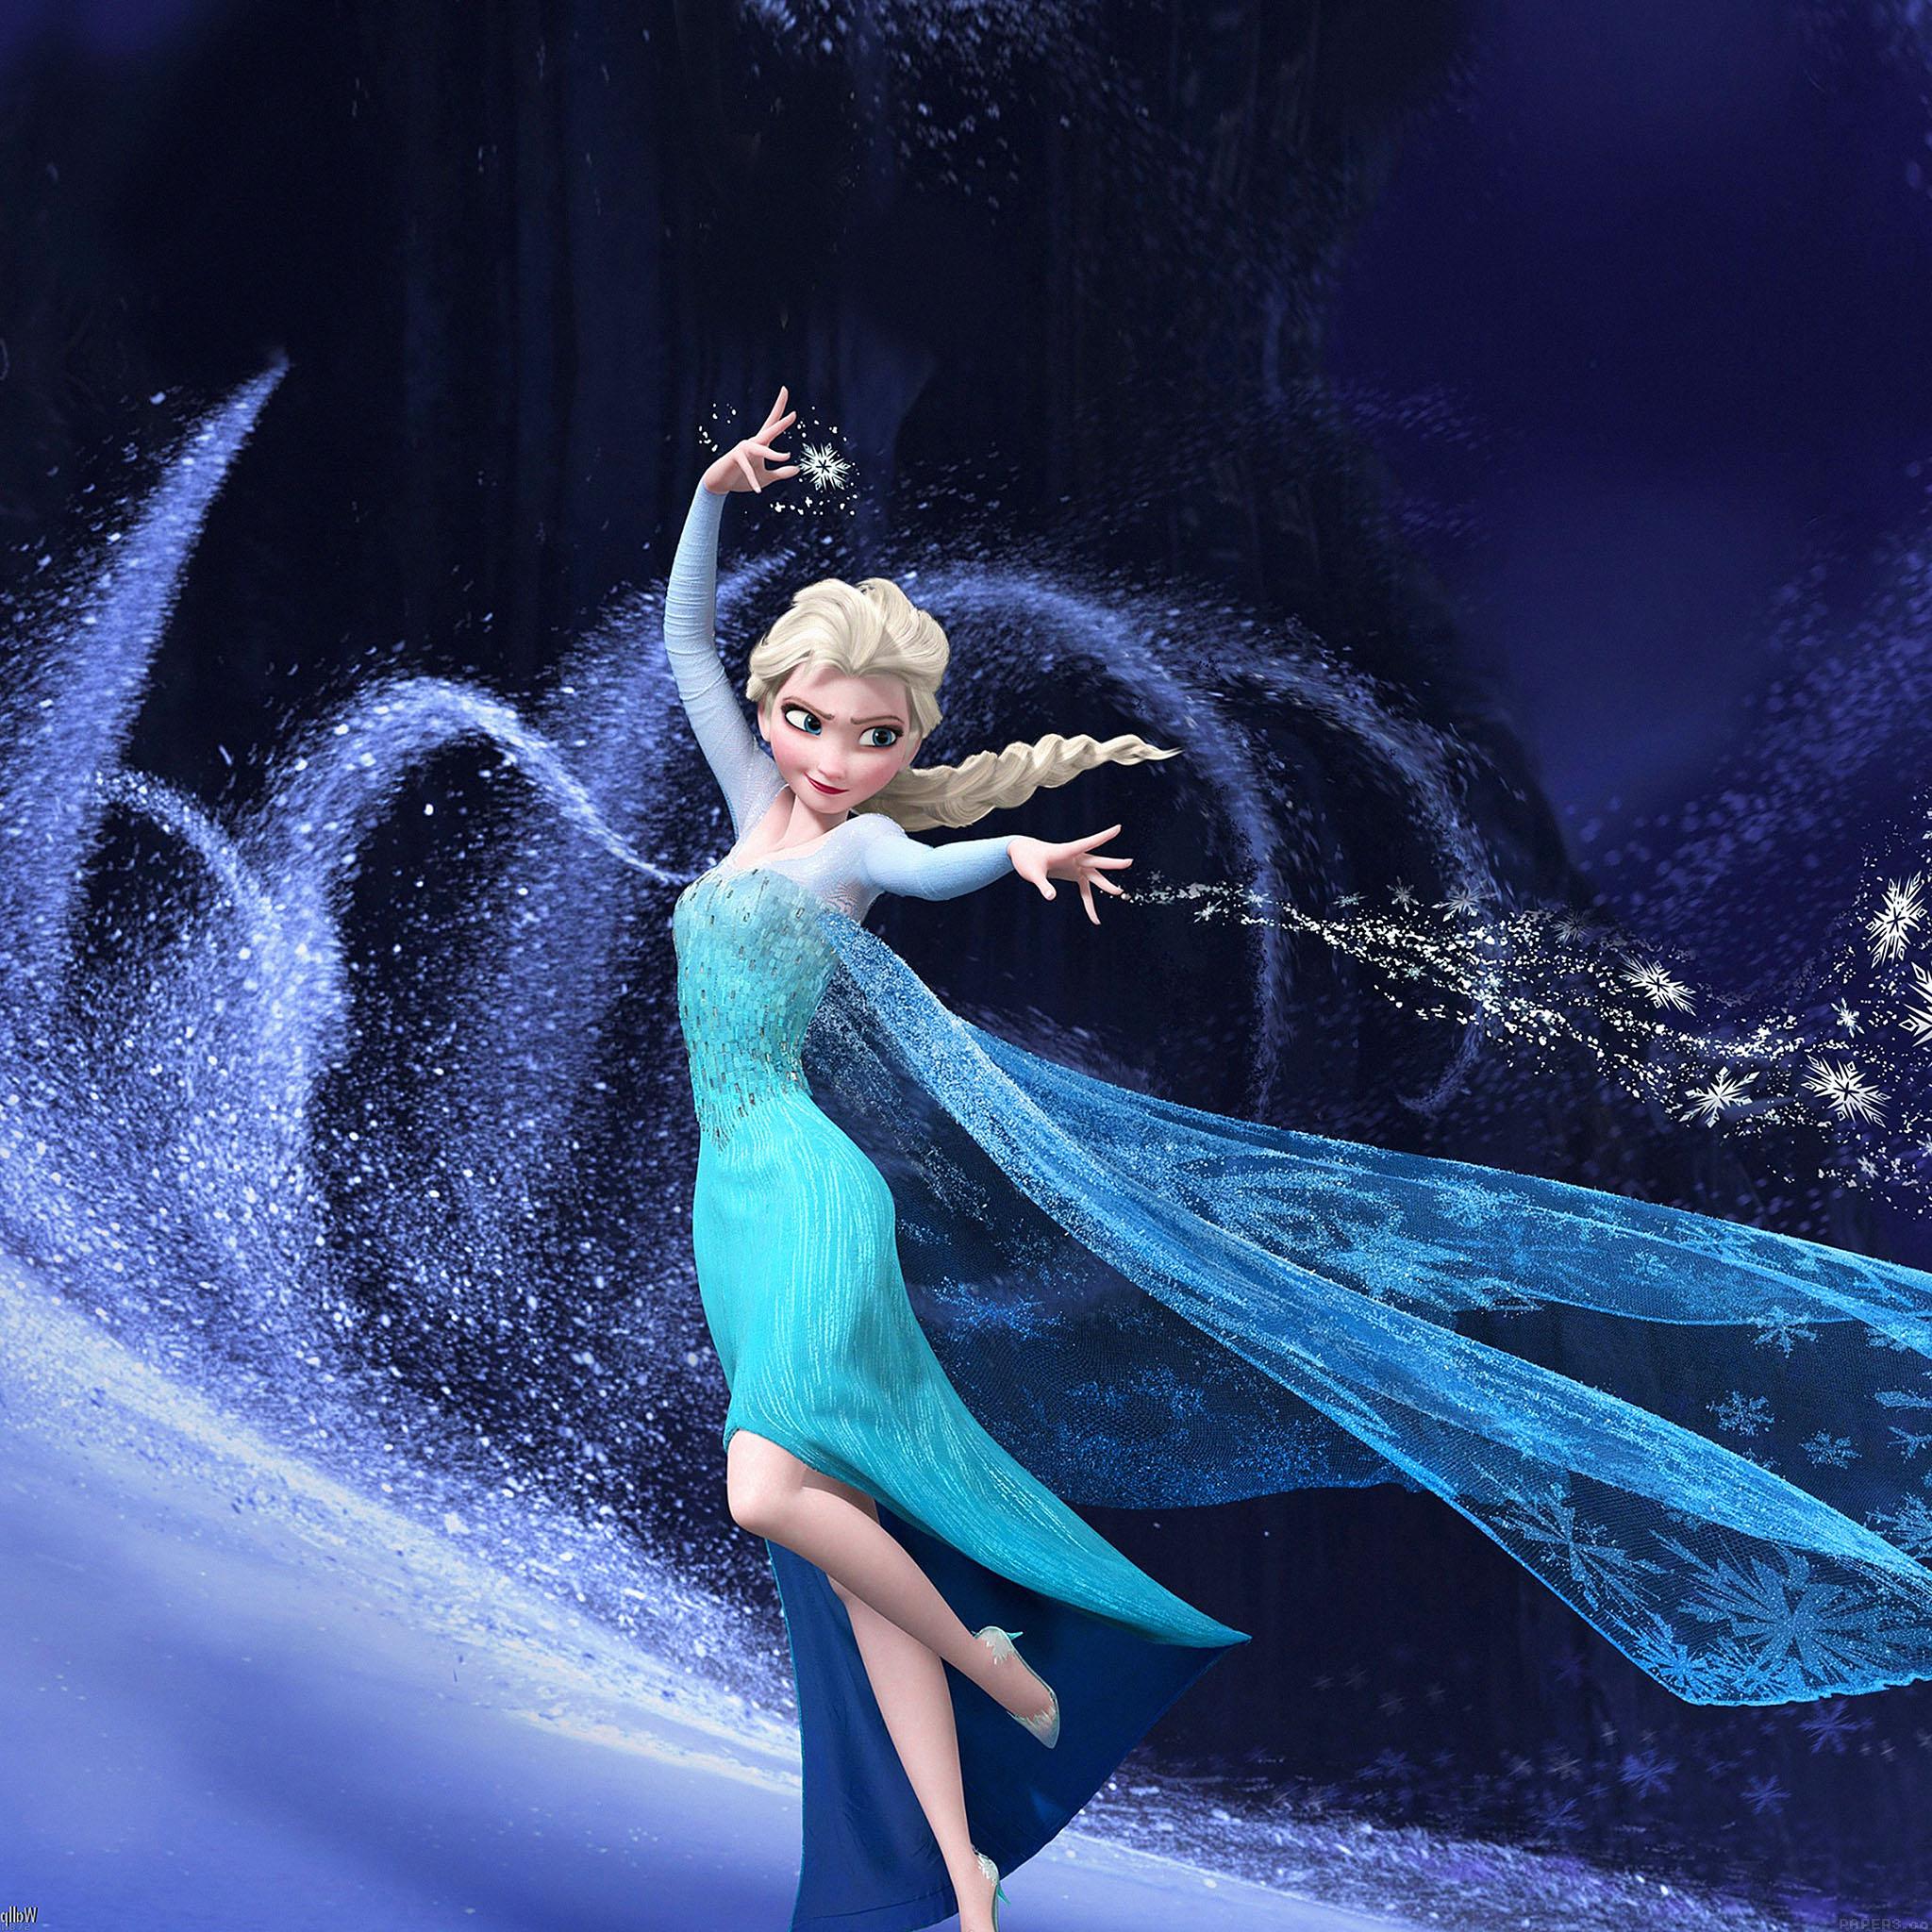 Ab72 Wallpaper Frozen Elsa Disney